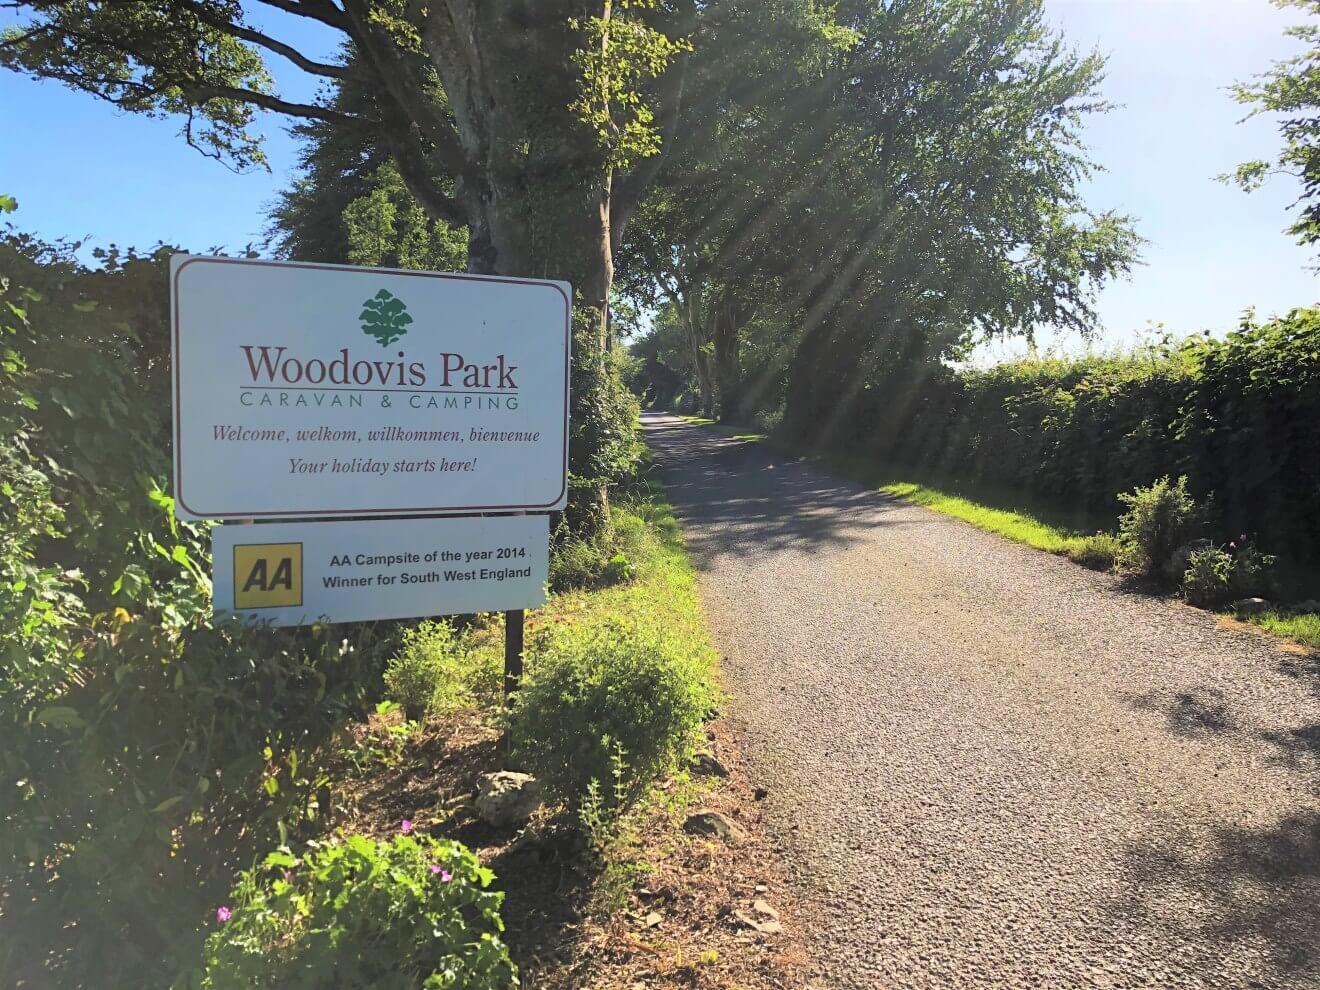 Woodovis Park Image 11